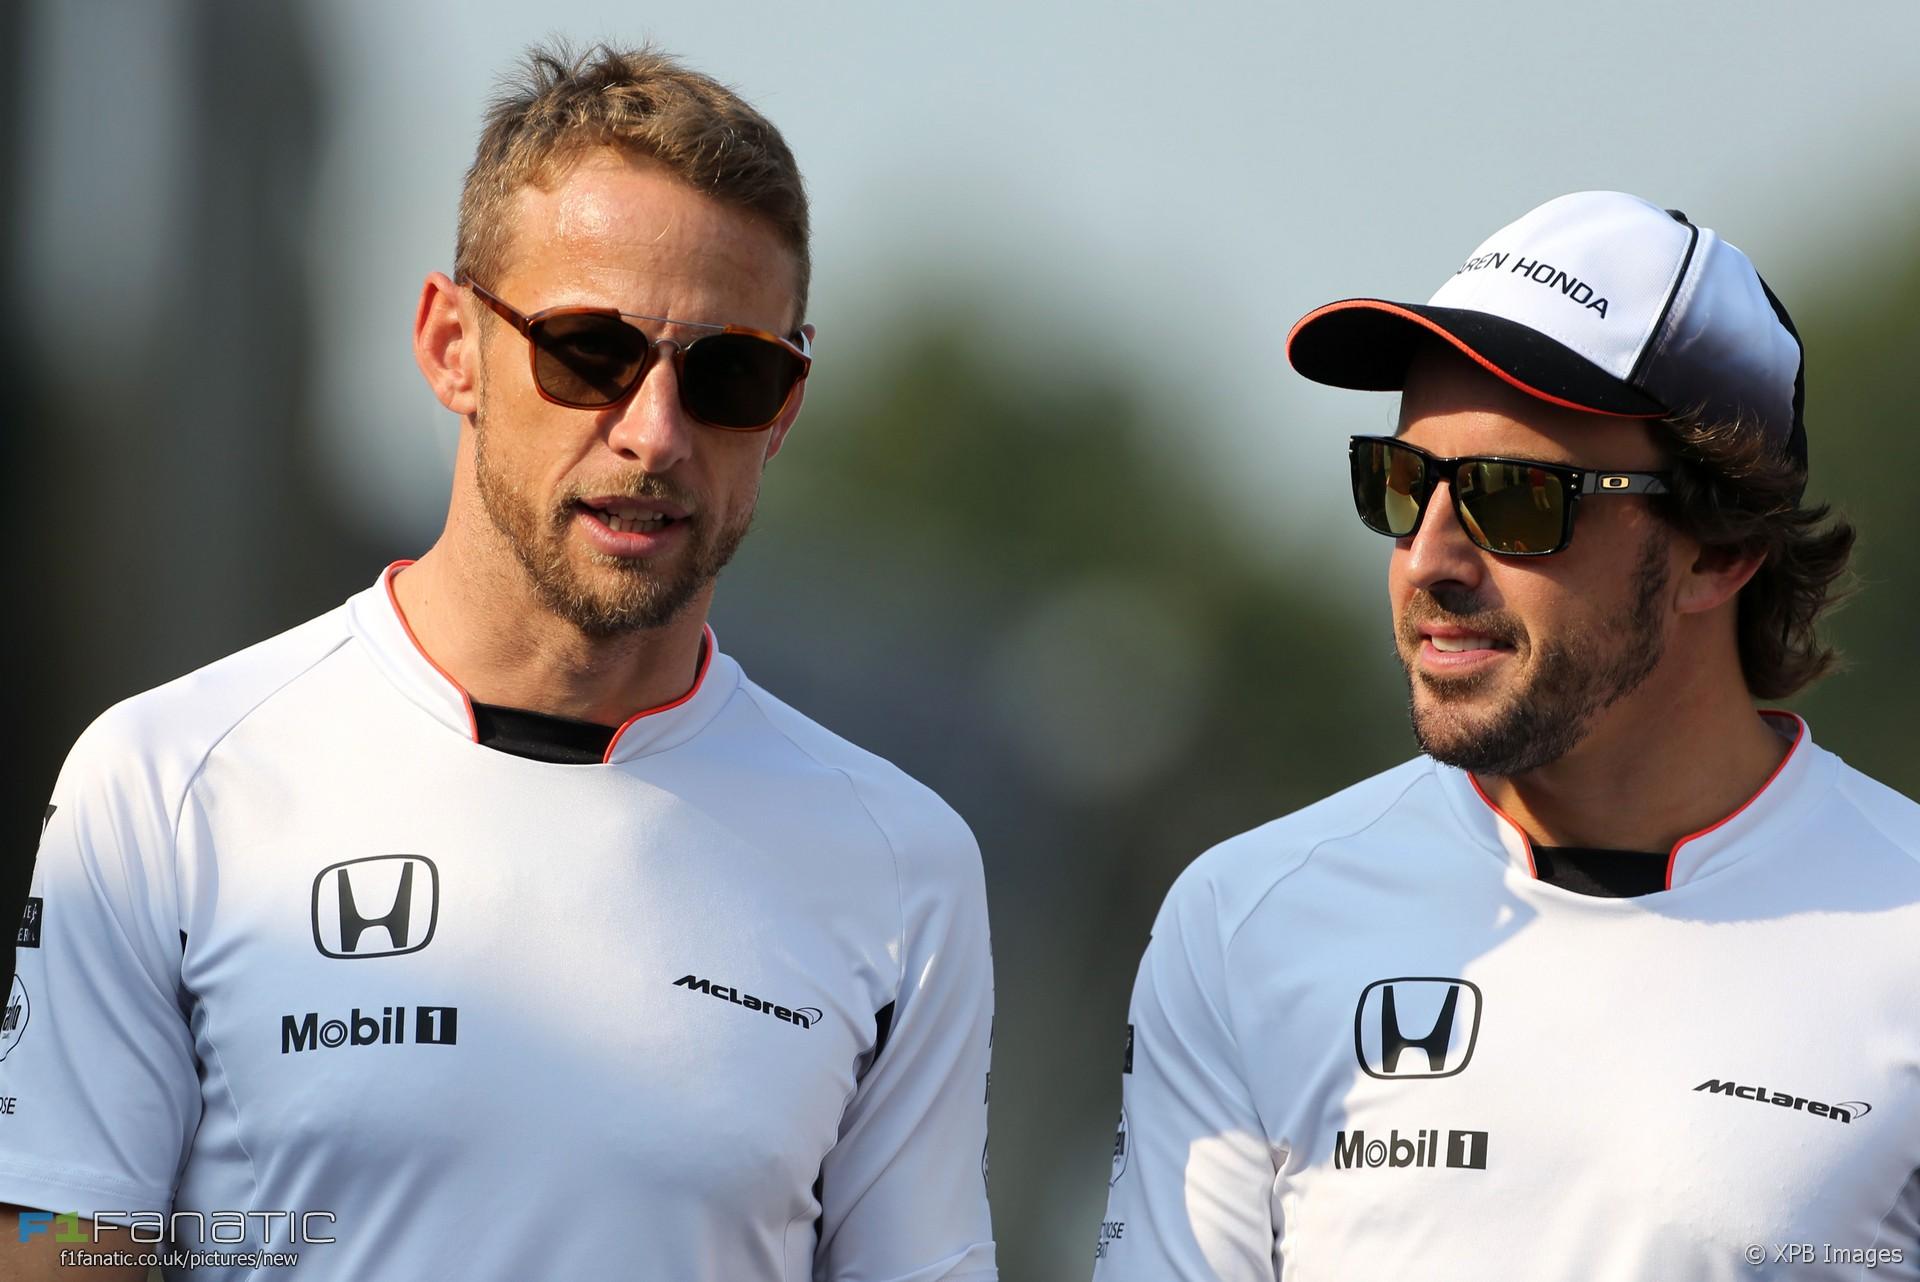 Jenson Button, Fernando Alonso, McLaren, Monza, 2016